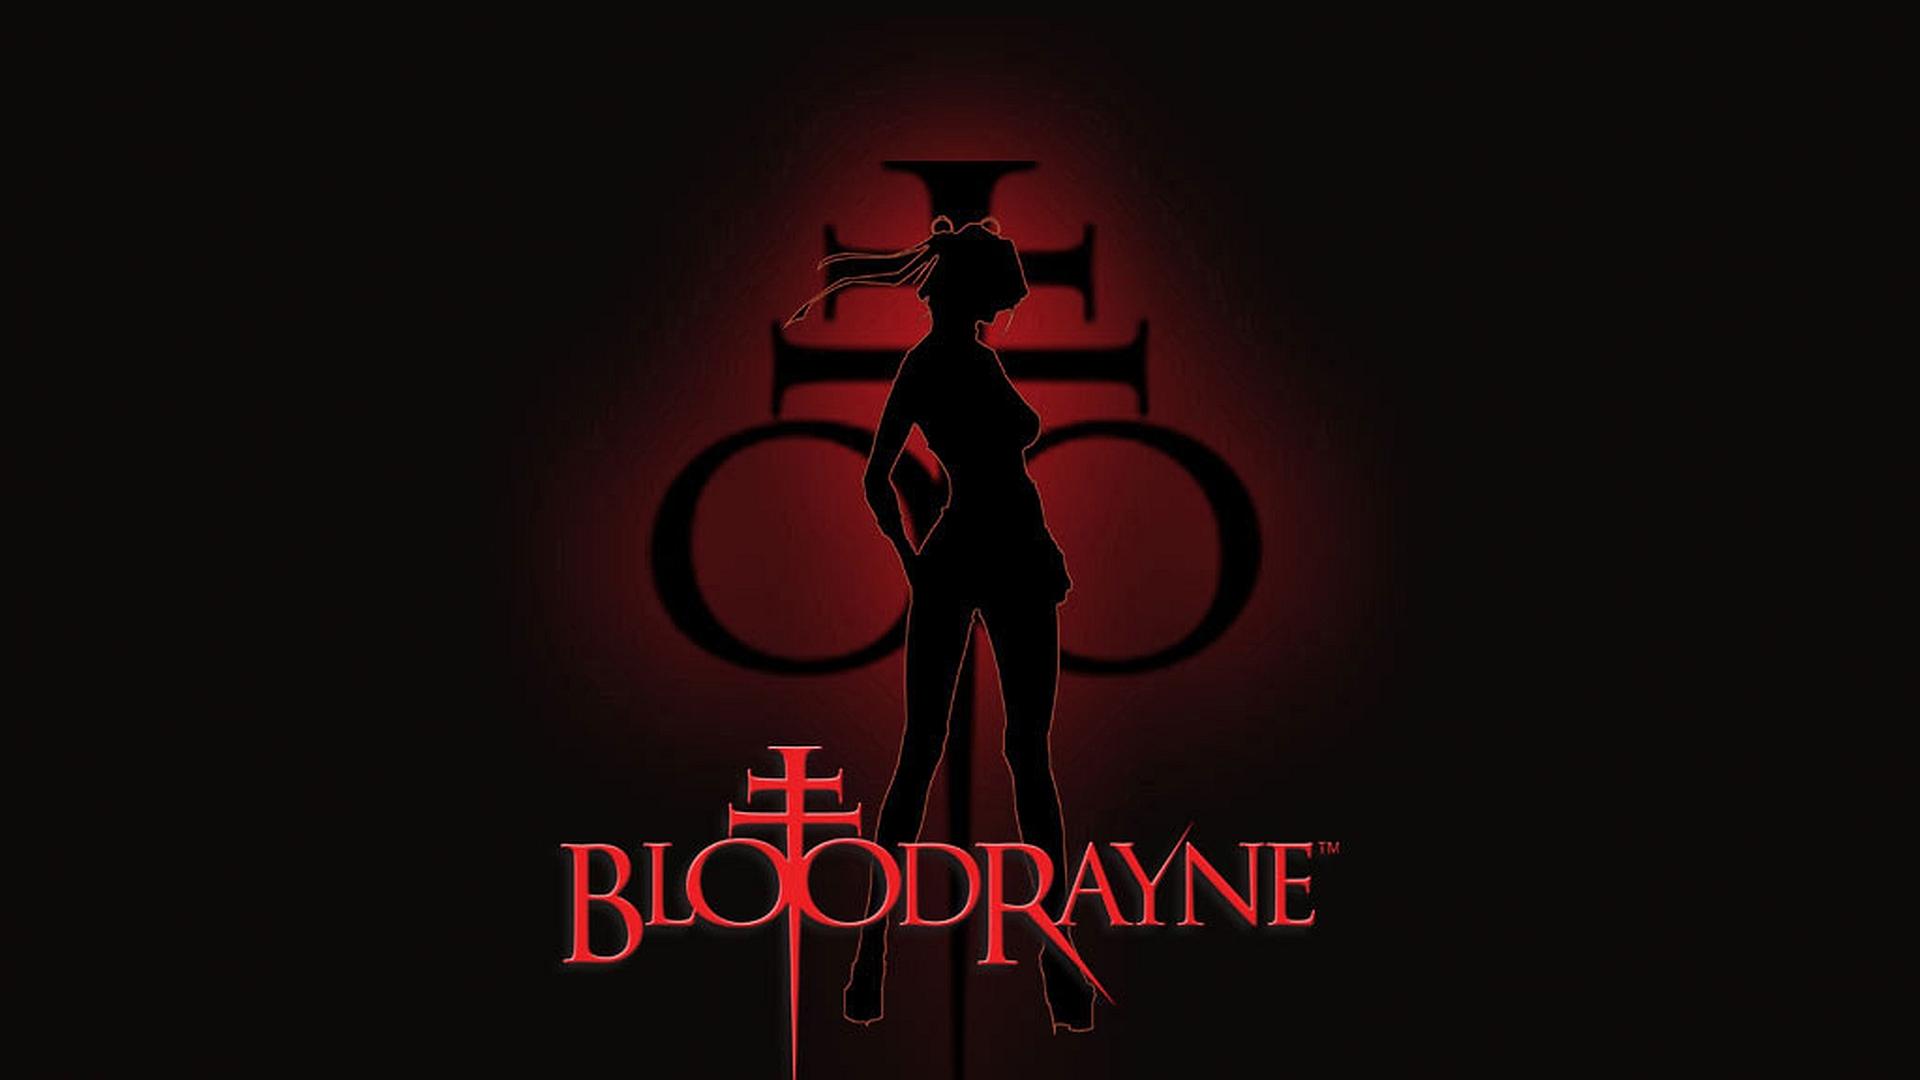 bloodrayne wallpaper 1920x1080-#27